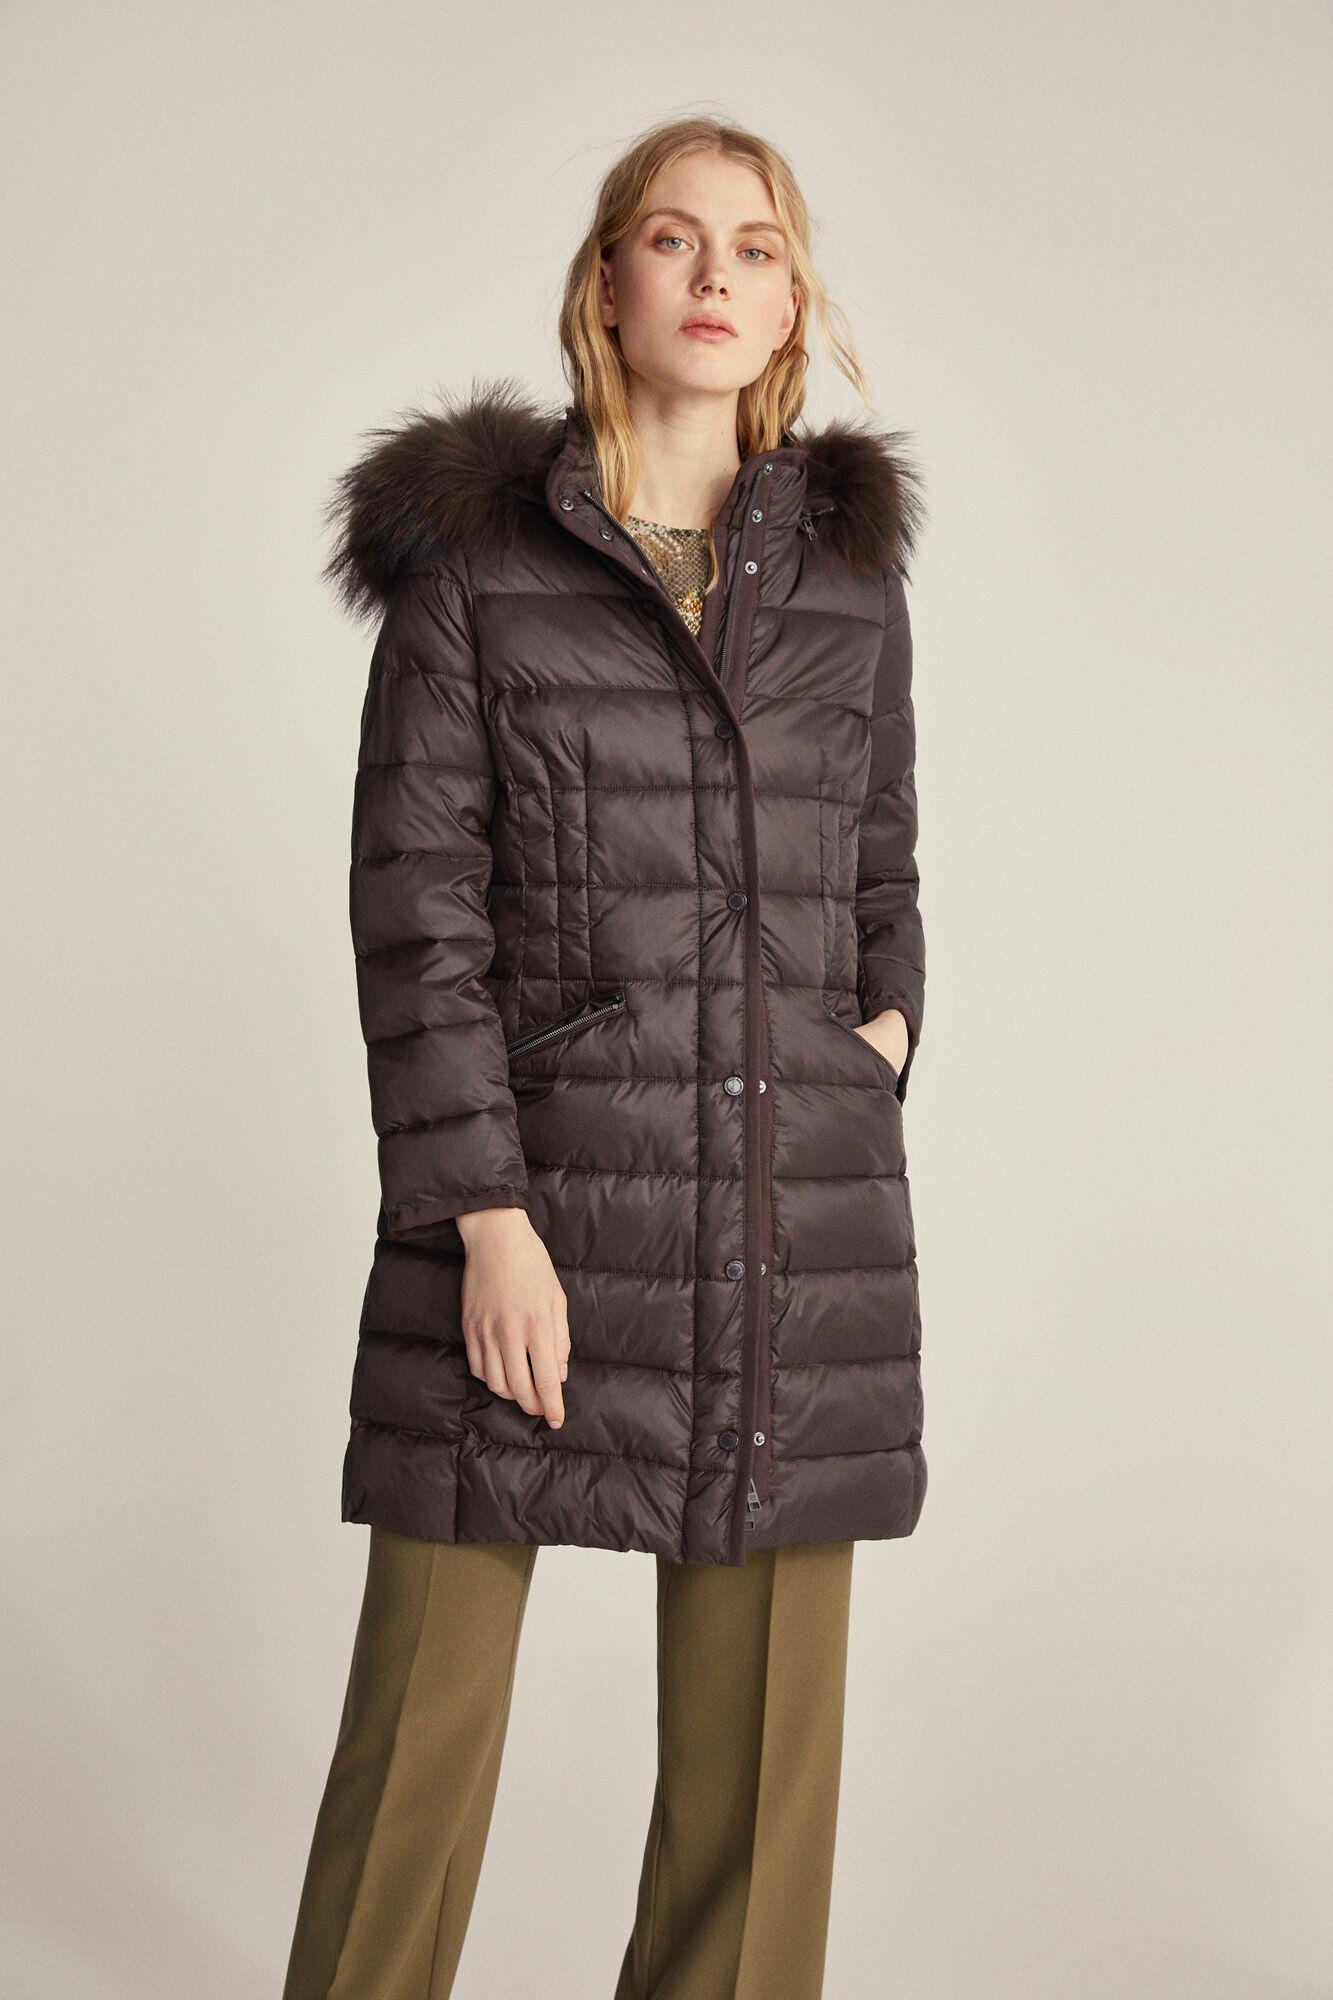 Sobretudos e casacos